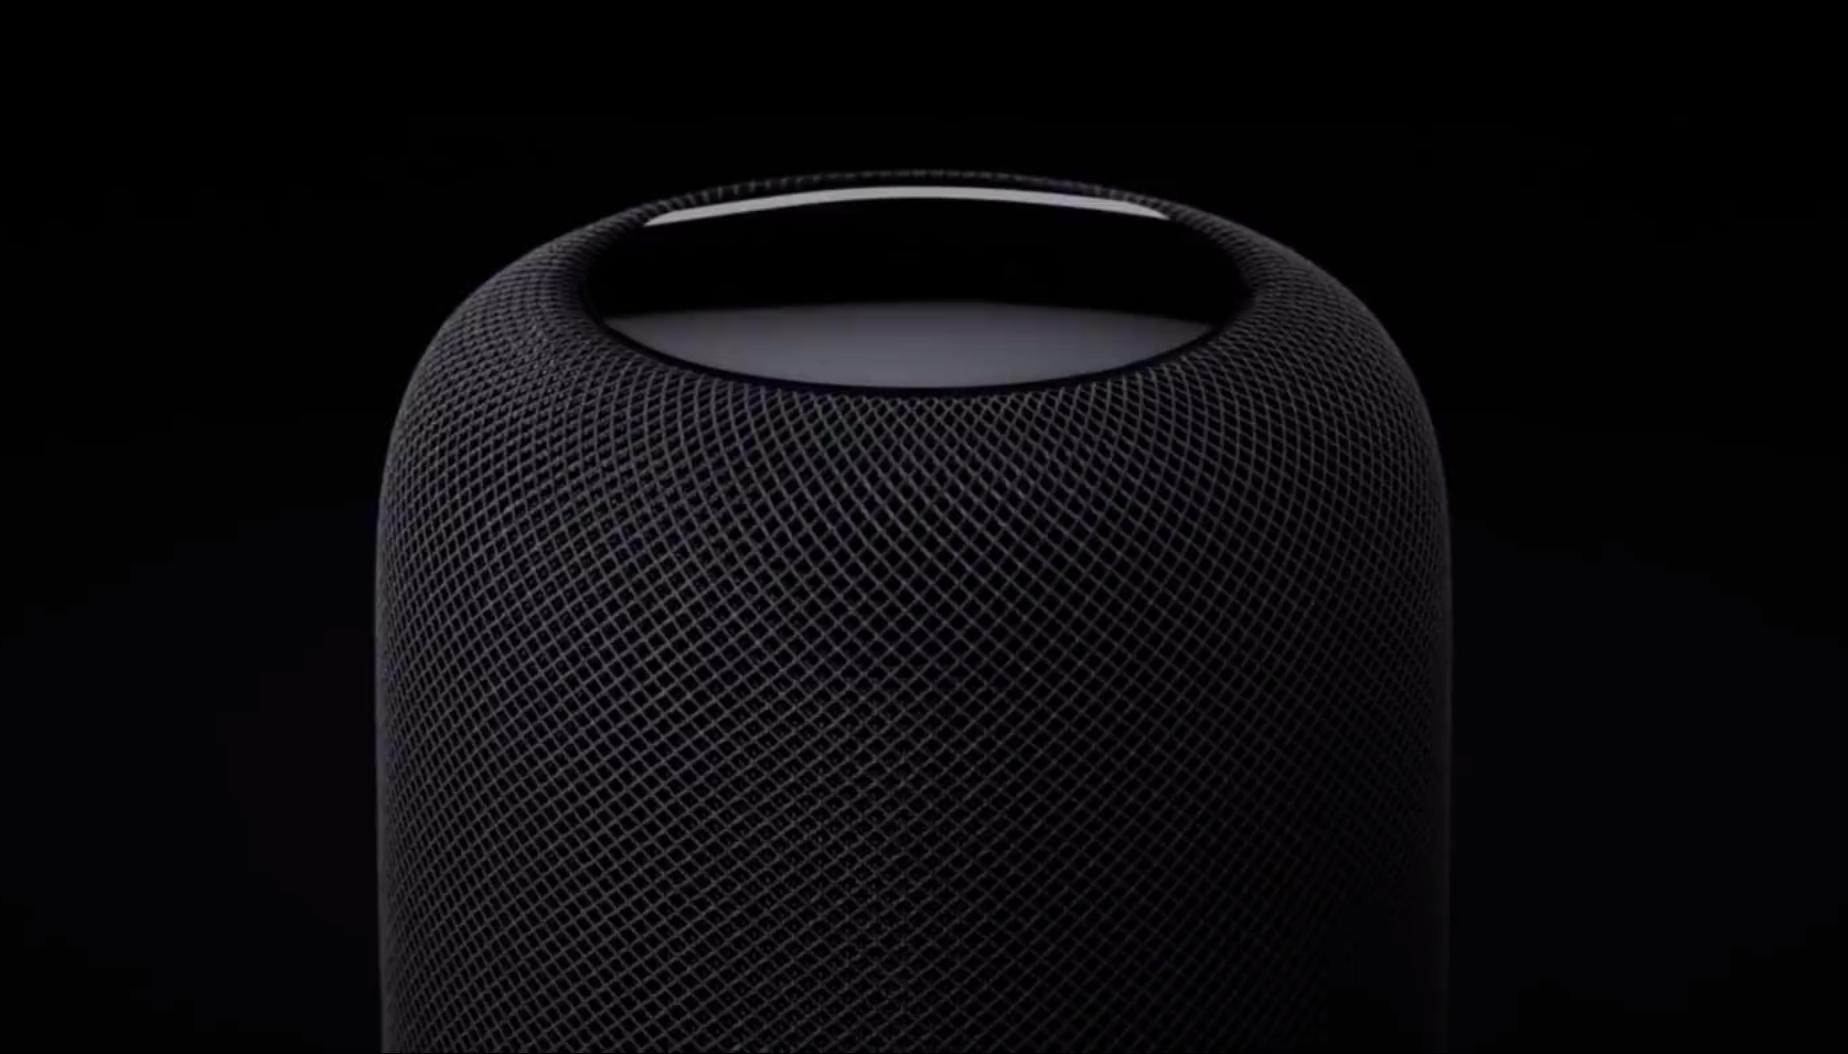 airplay 2 co to jest i jakie urz dzenia apple dostan. Black Bedroom Furniture Sets. Home Design Ideas